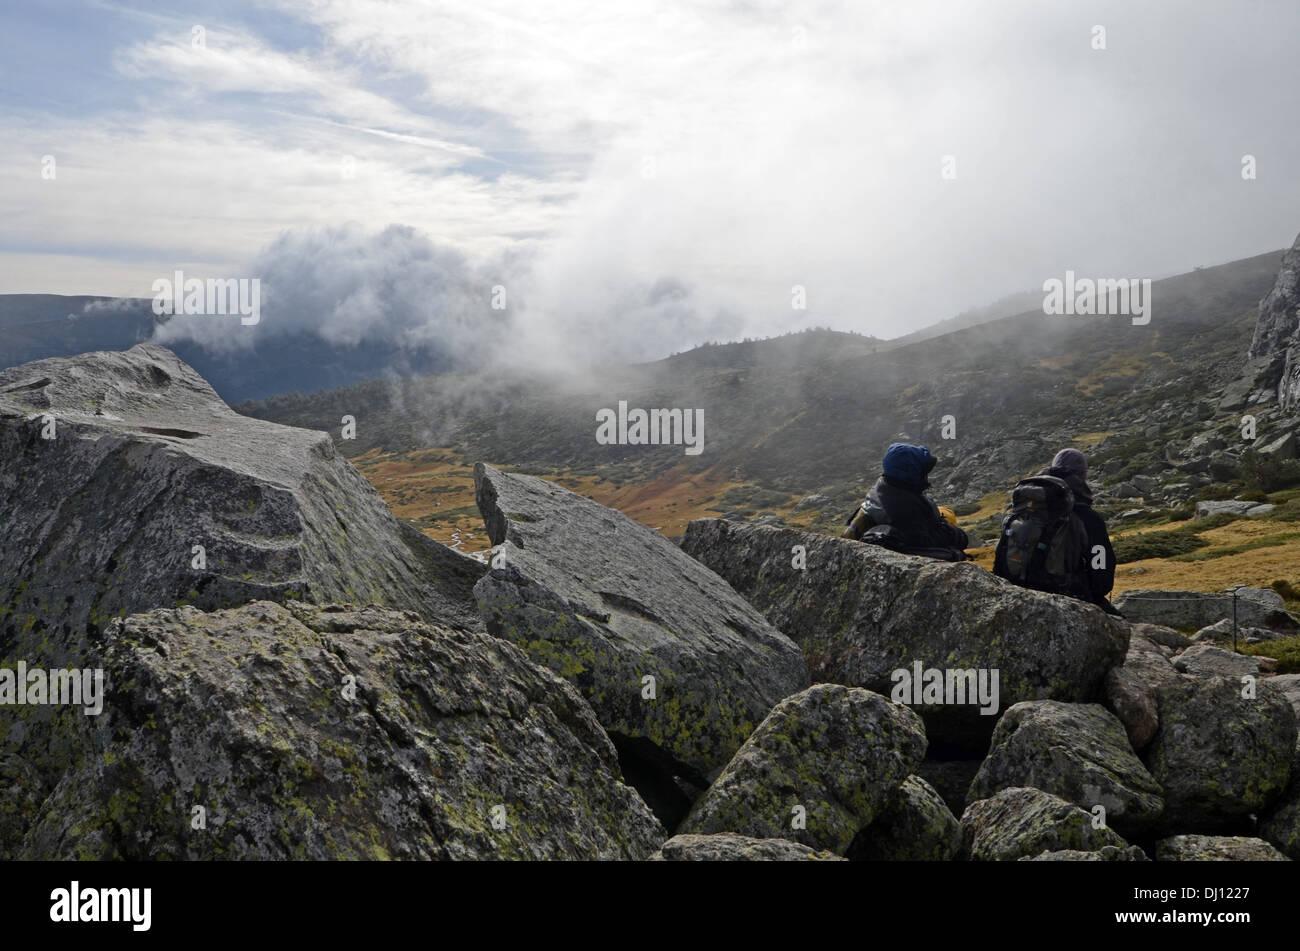 Hikers in Peñalara, highest mountain peak in the mountain range of Guadarrama, Spain Stock Photo